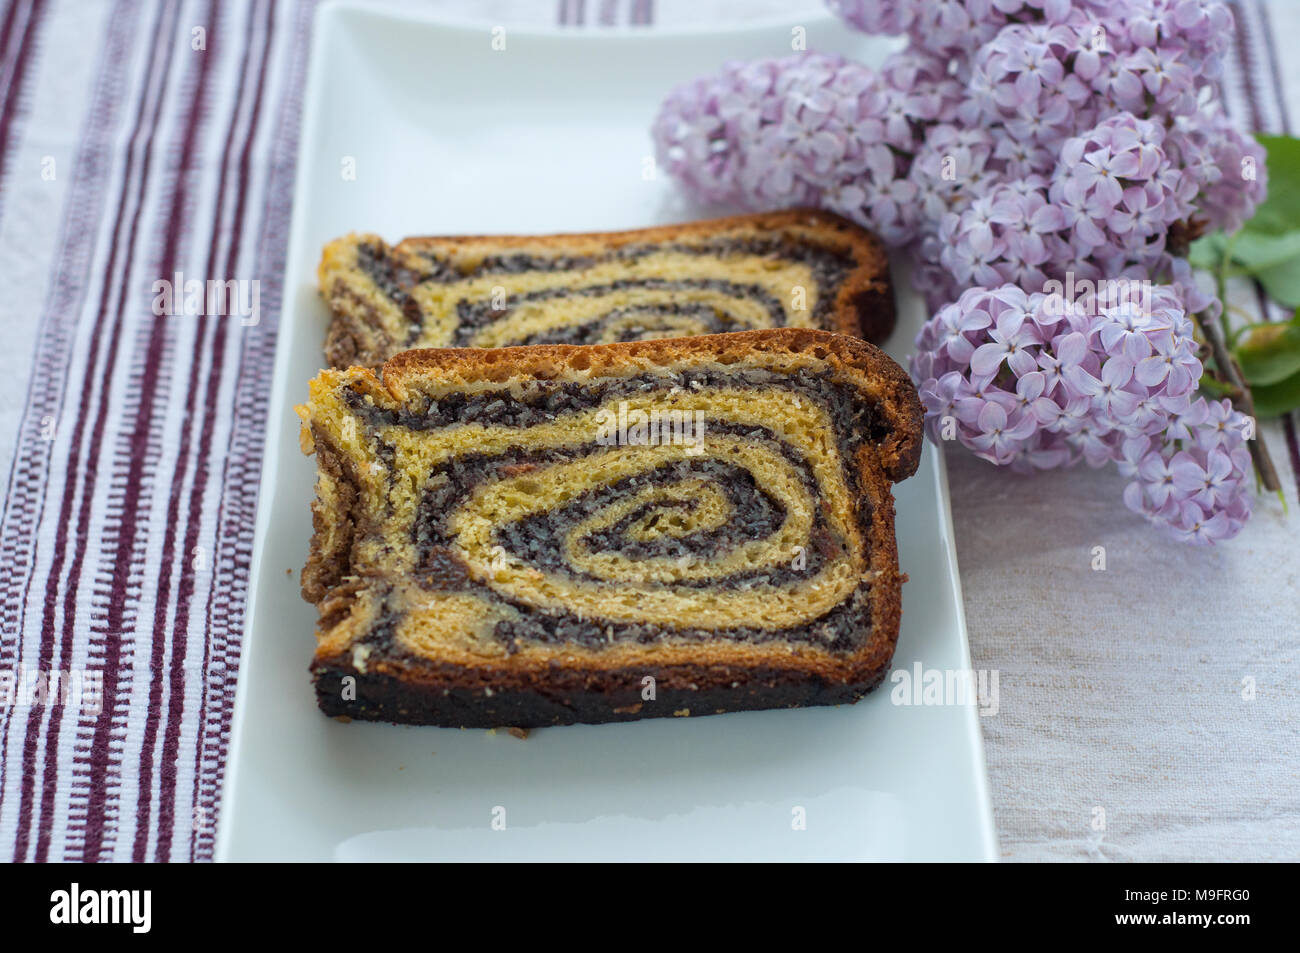 Kroatische Kuchen Gibanica Mit Mohn Stockfoto Bild 177983344 Alamy